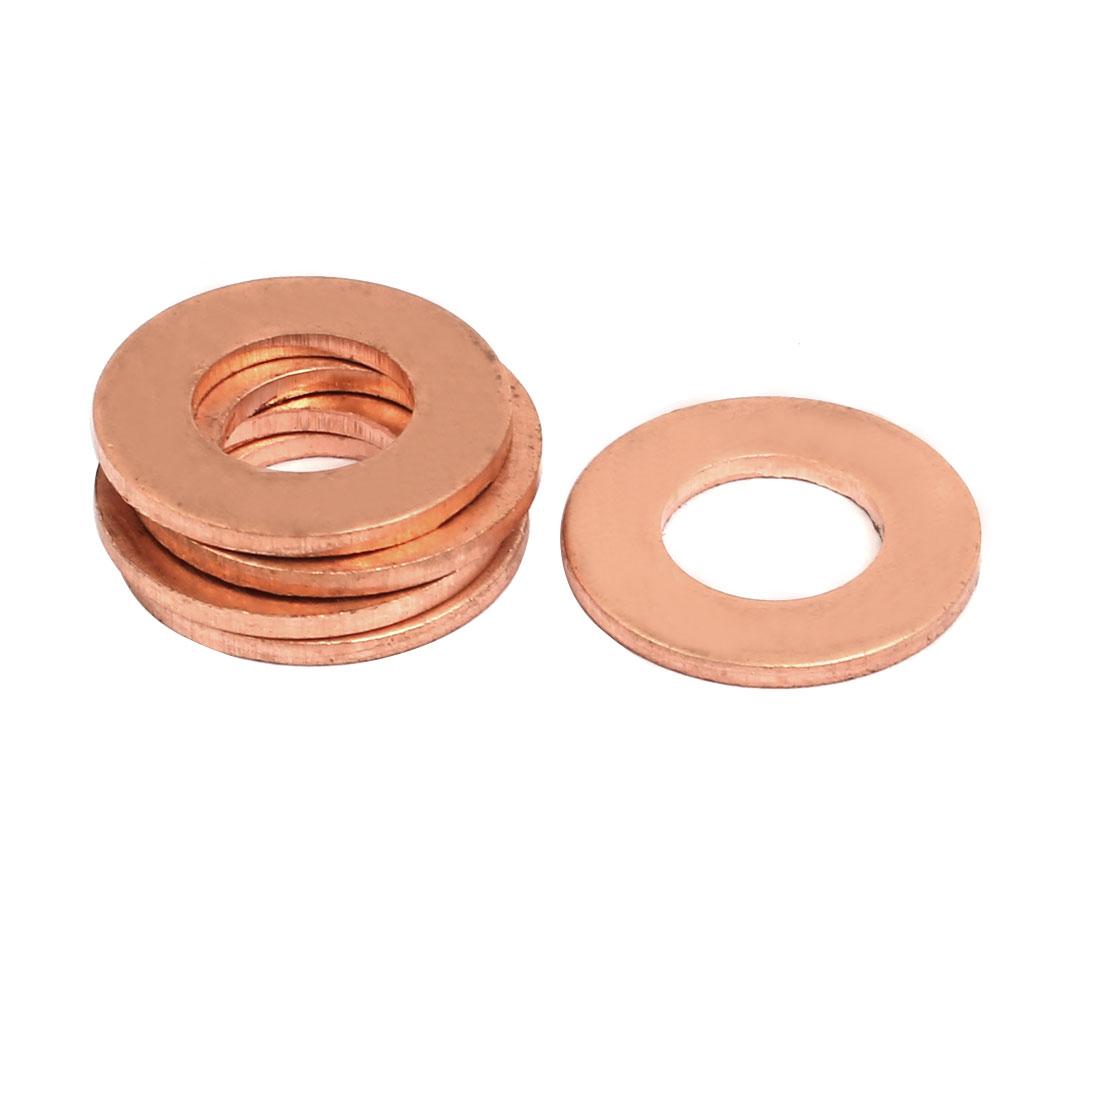 5pcs 10mmx20mmx1.5mm Copper Flat Ring Sealing Crush Washer Gasket